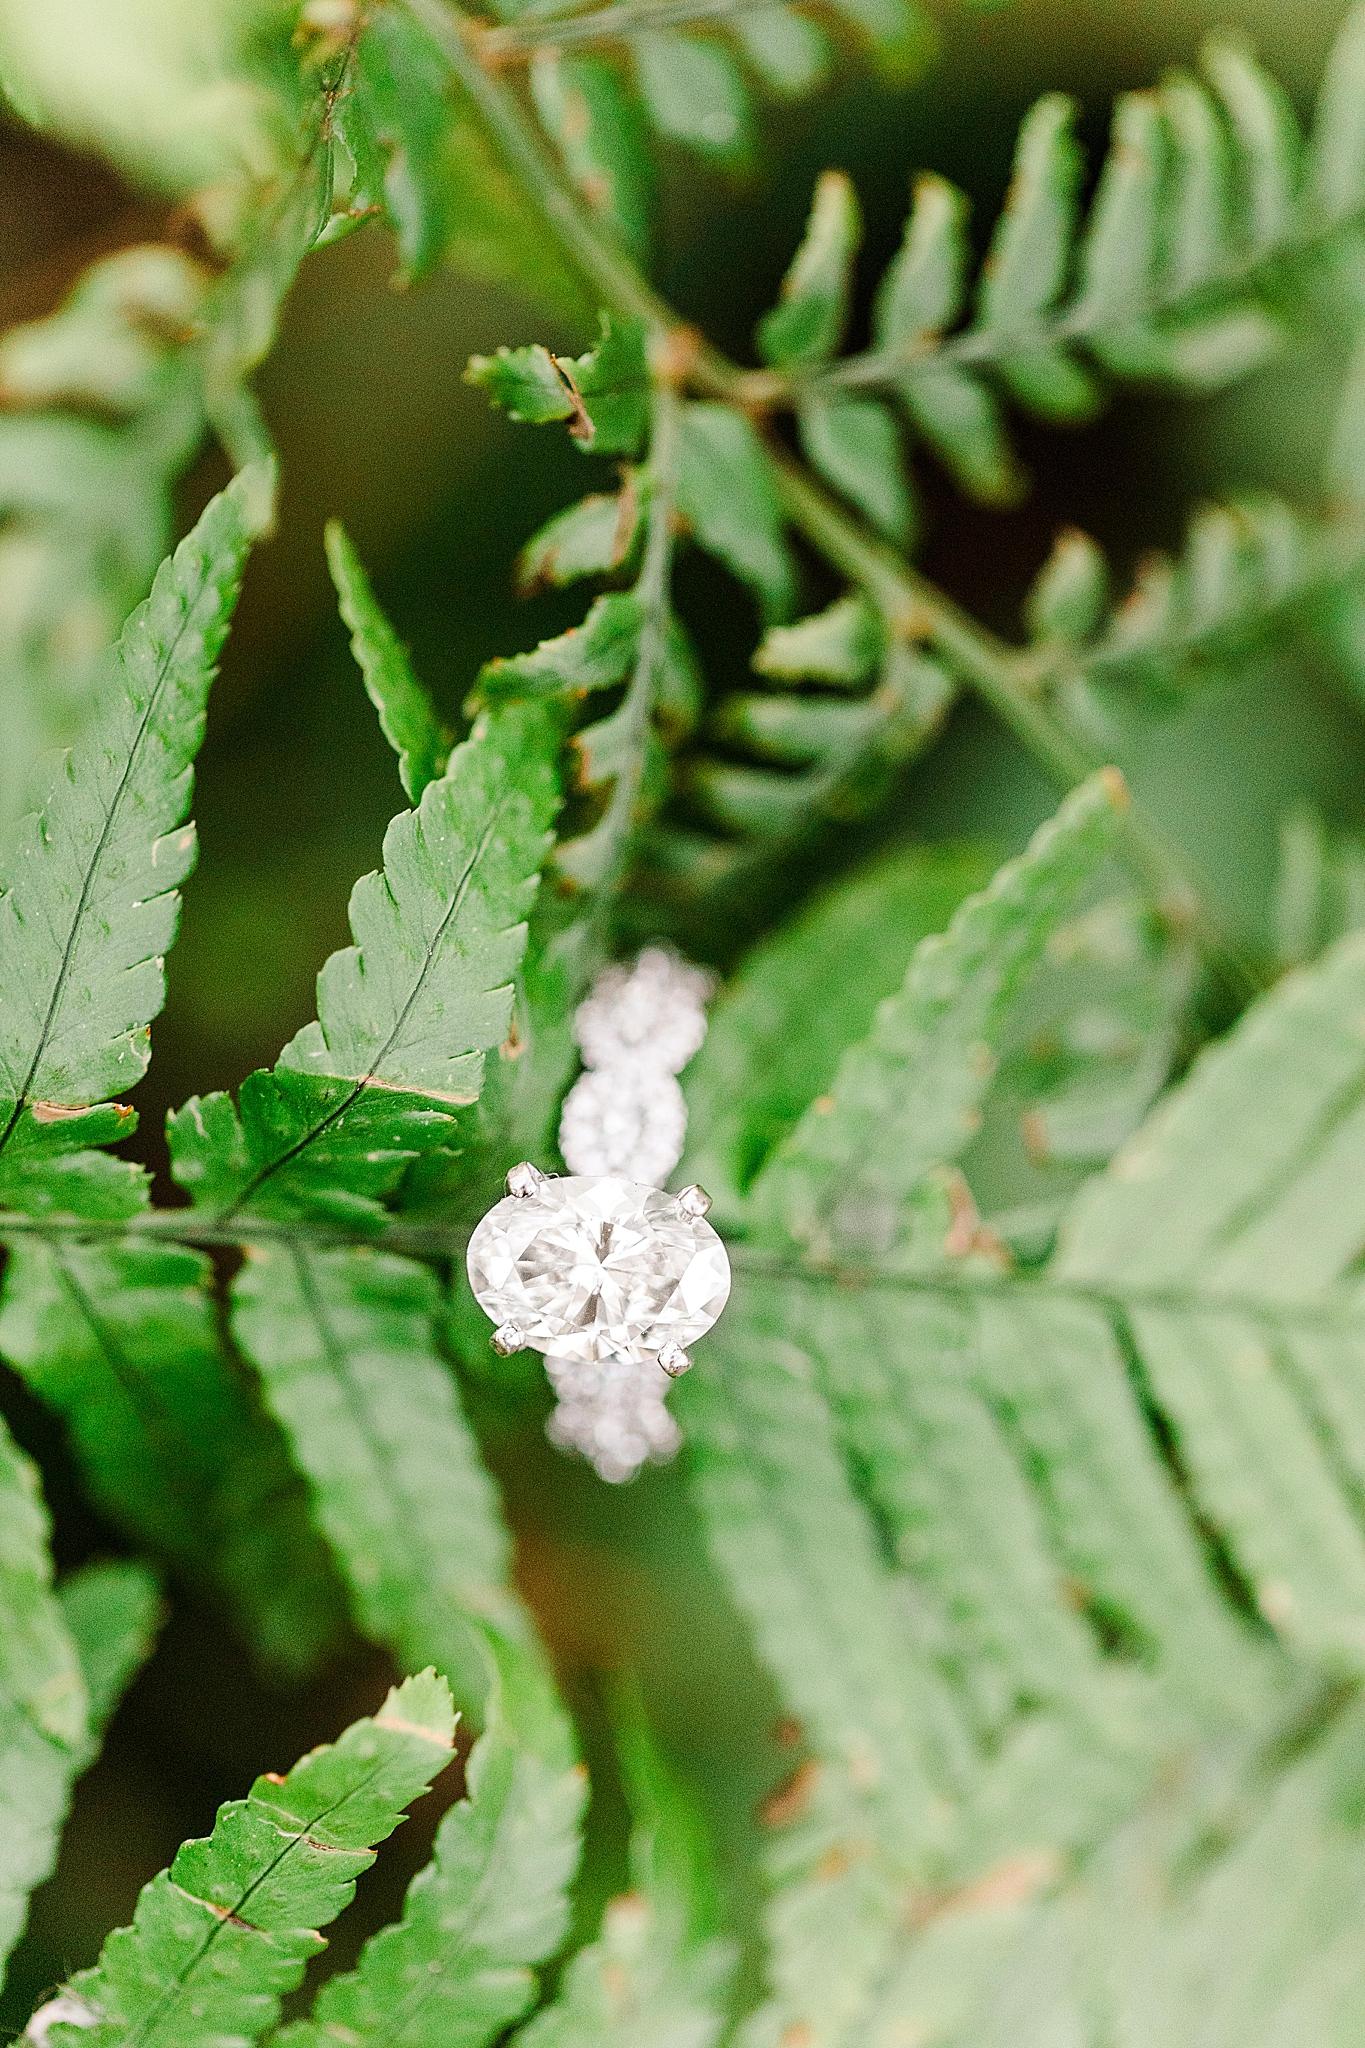 engagement ring on ferns during Orange Street Pier engagement photos